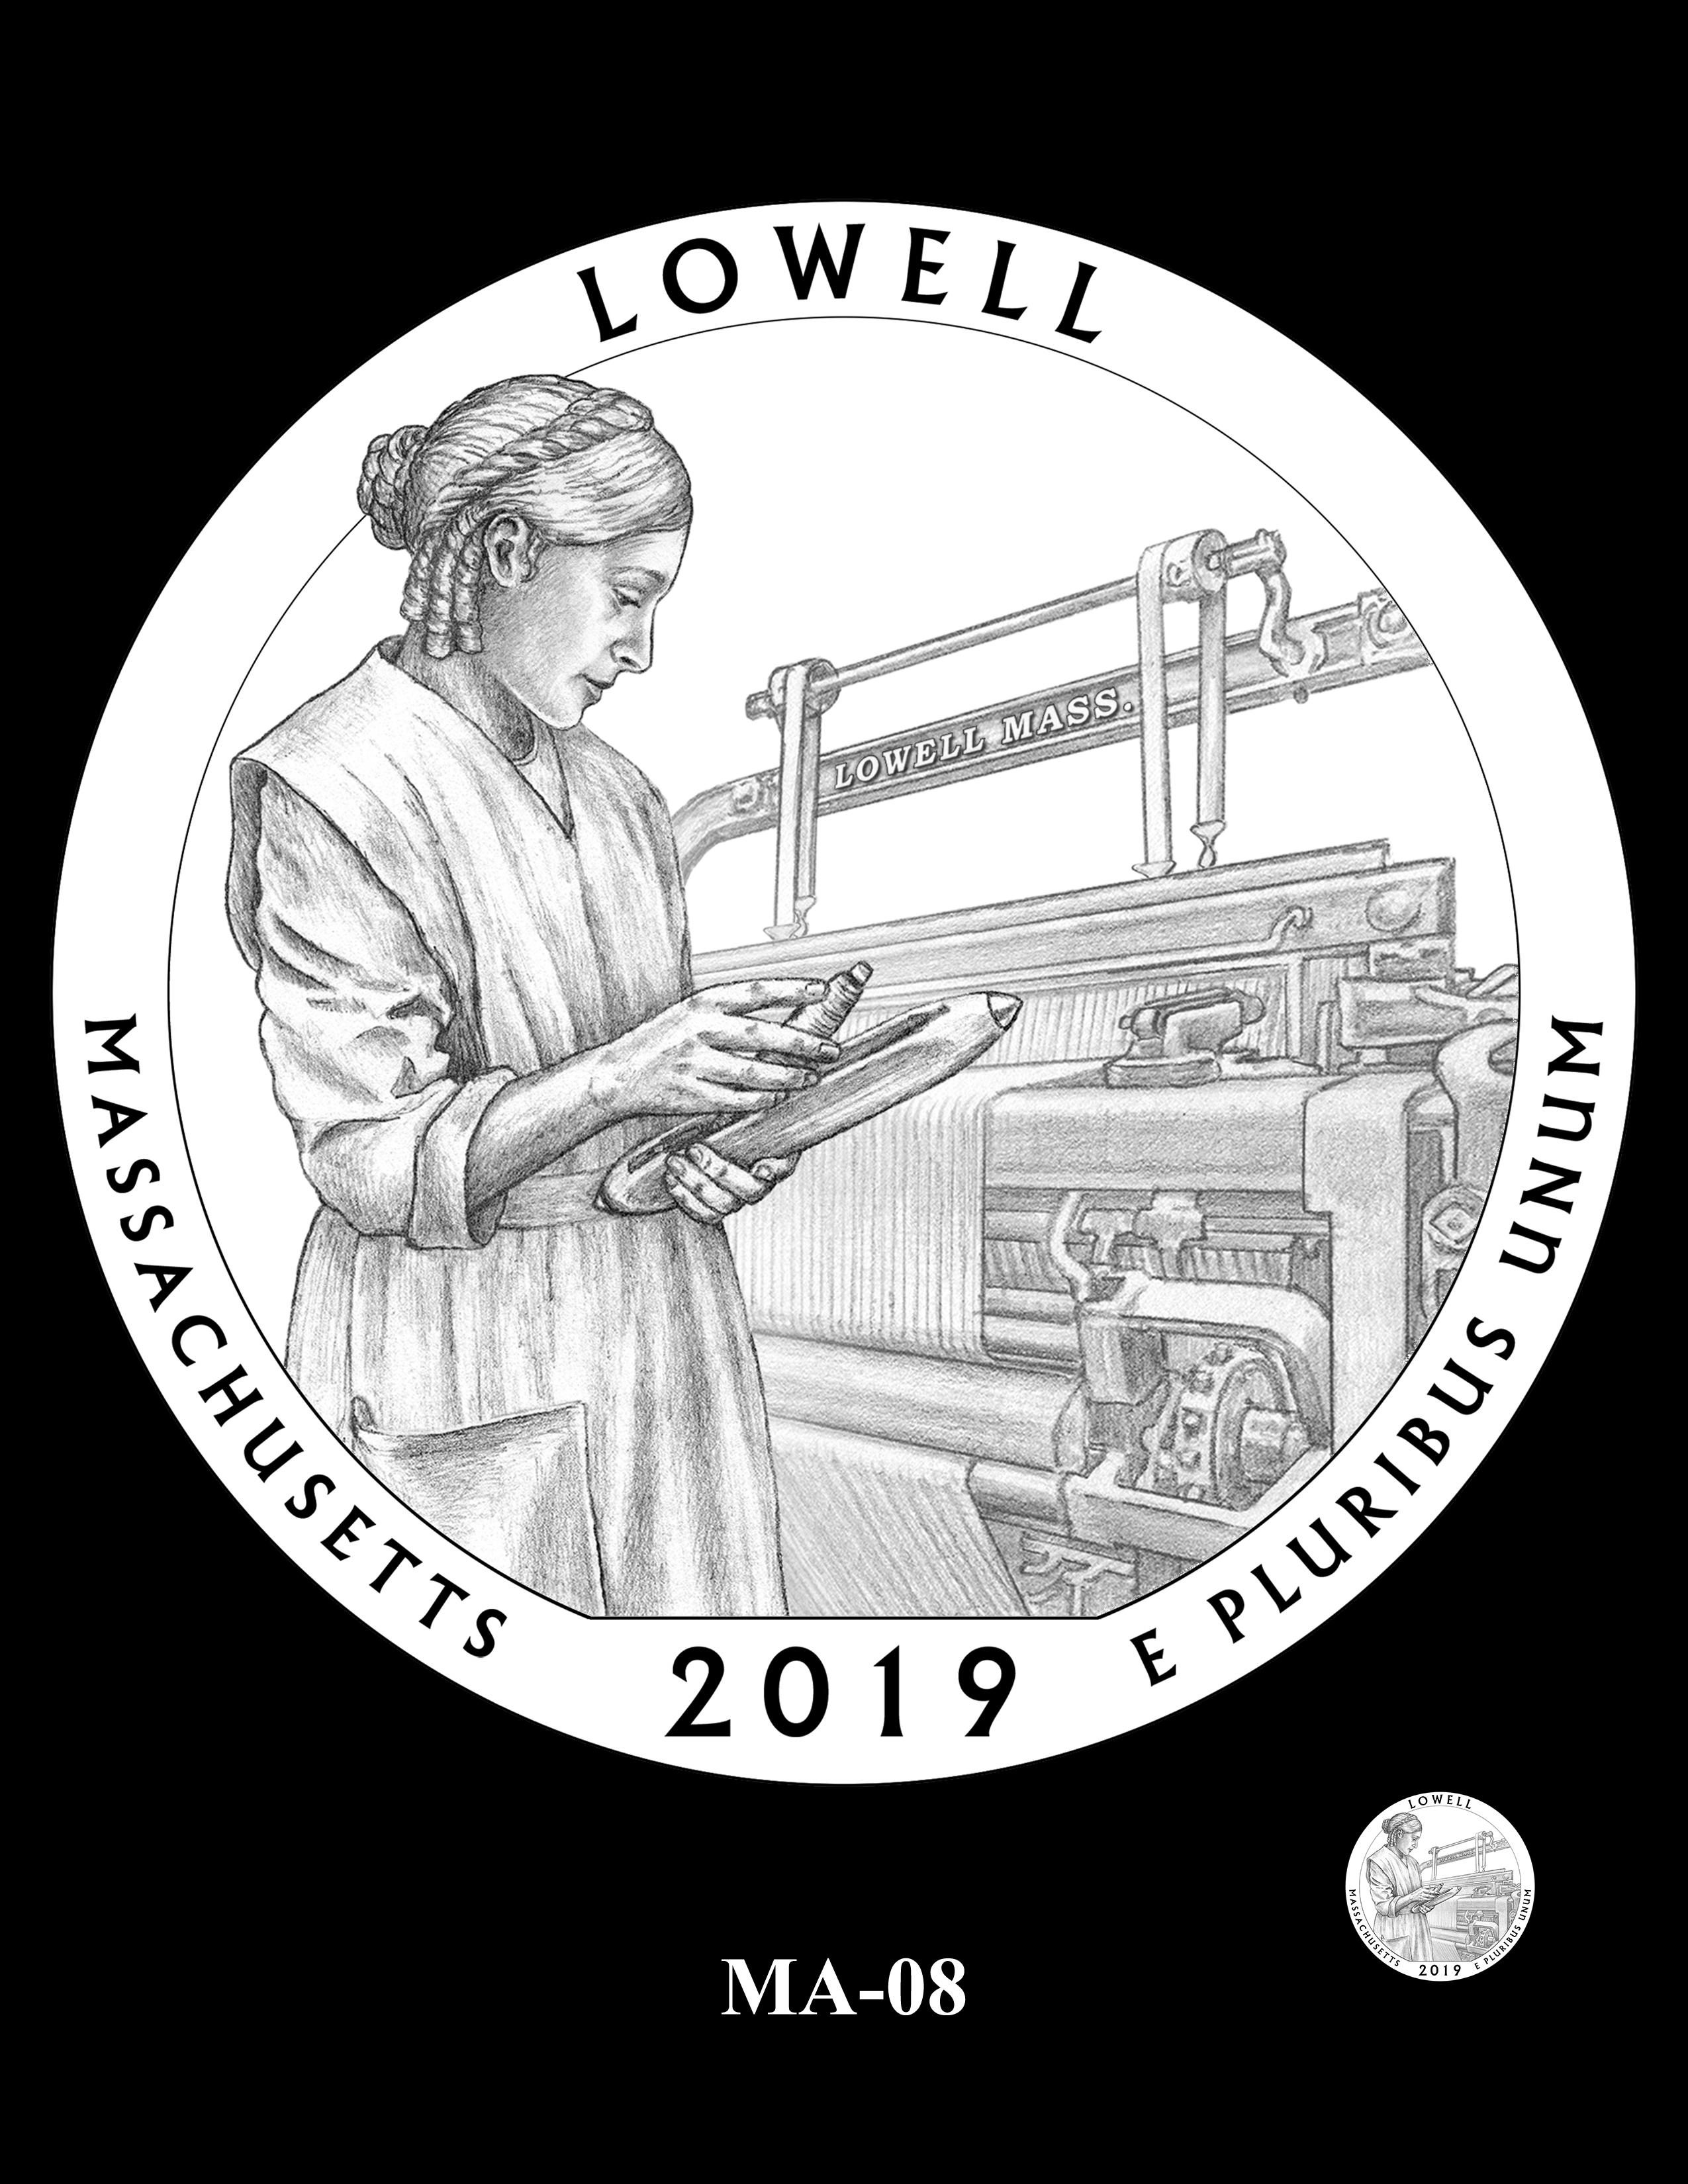 MA-08 -- 2019 America the Beautiful Quarters® Program